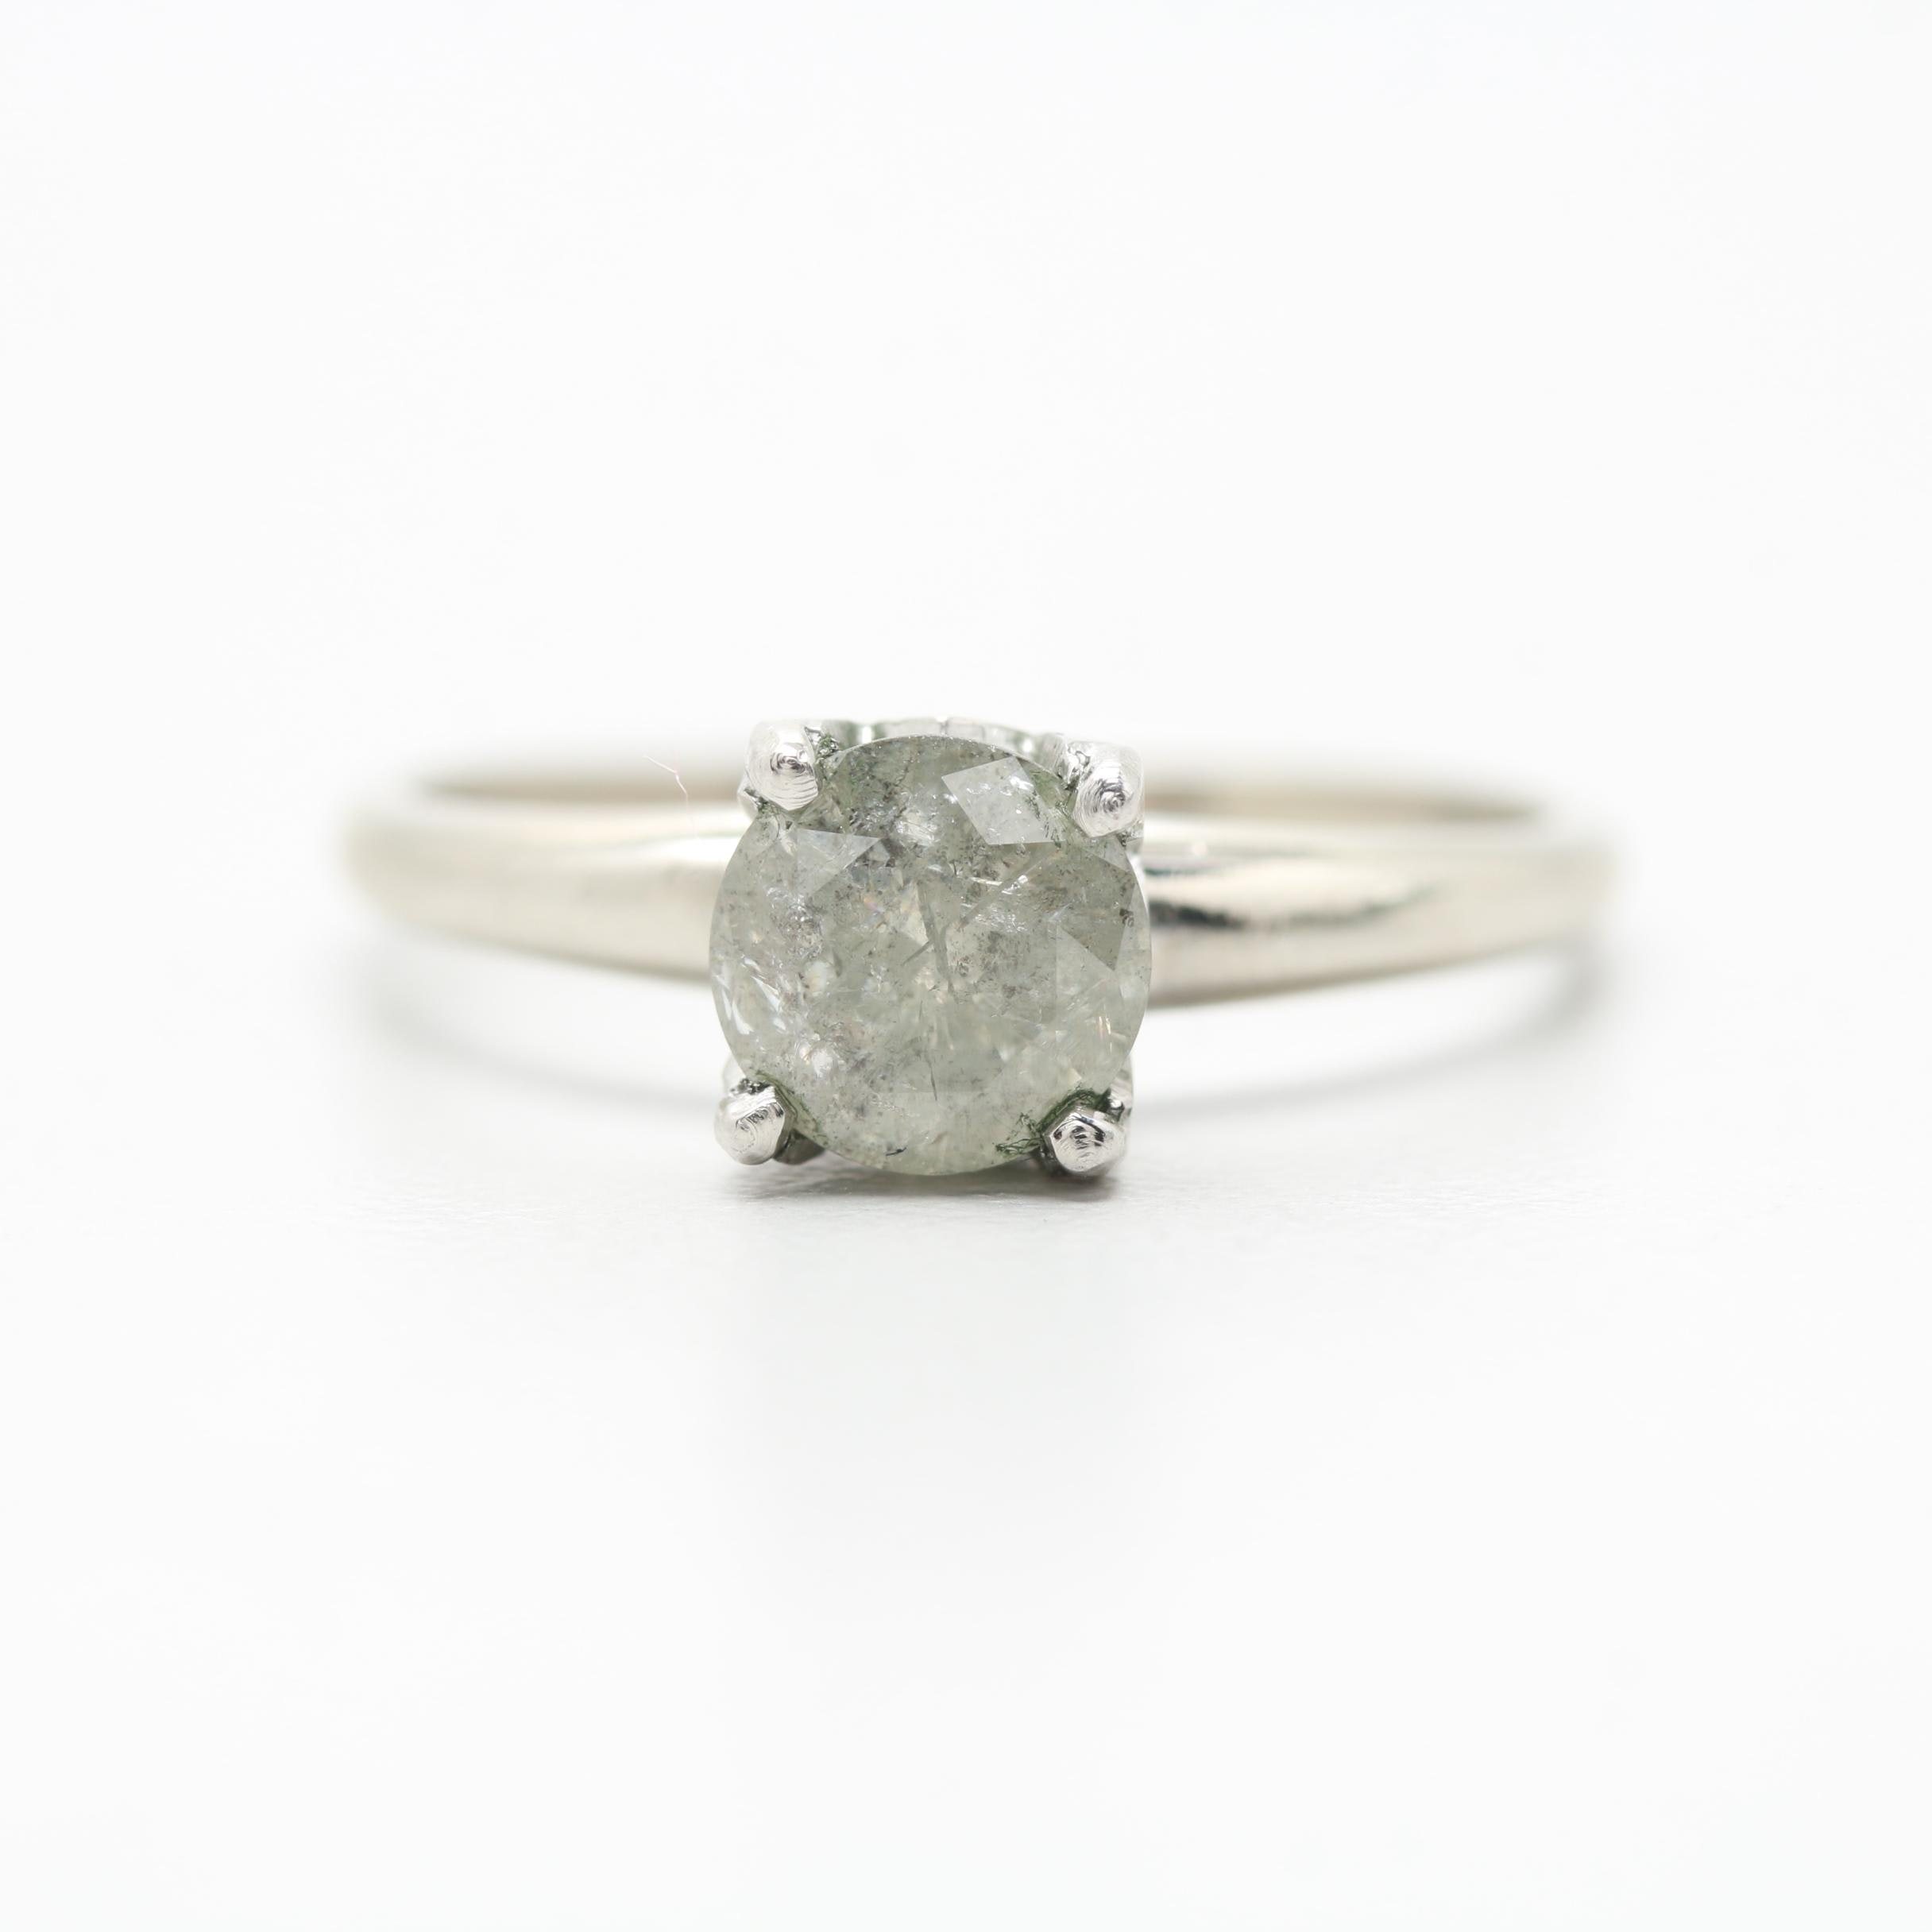 Platinum and 14K White Gold Diamond Ring